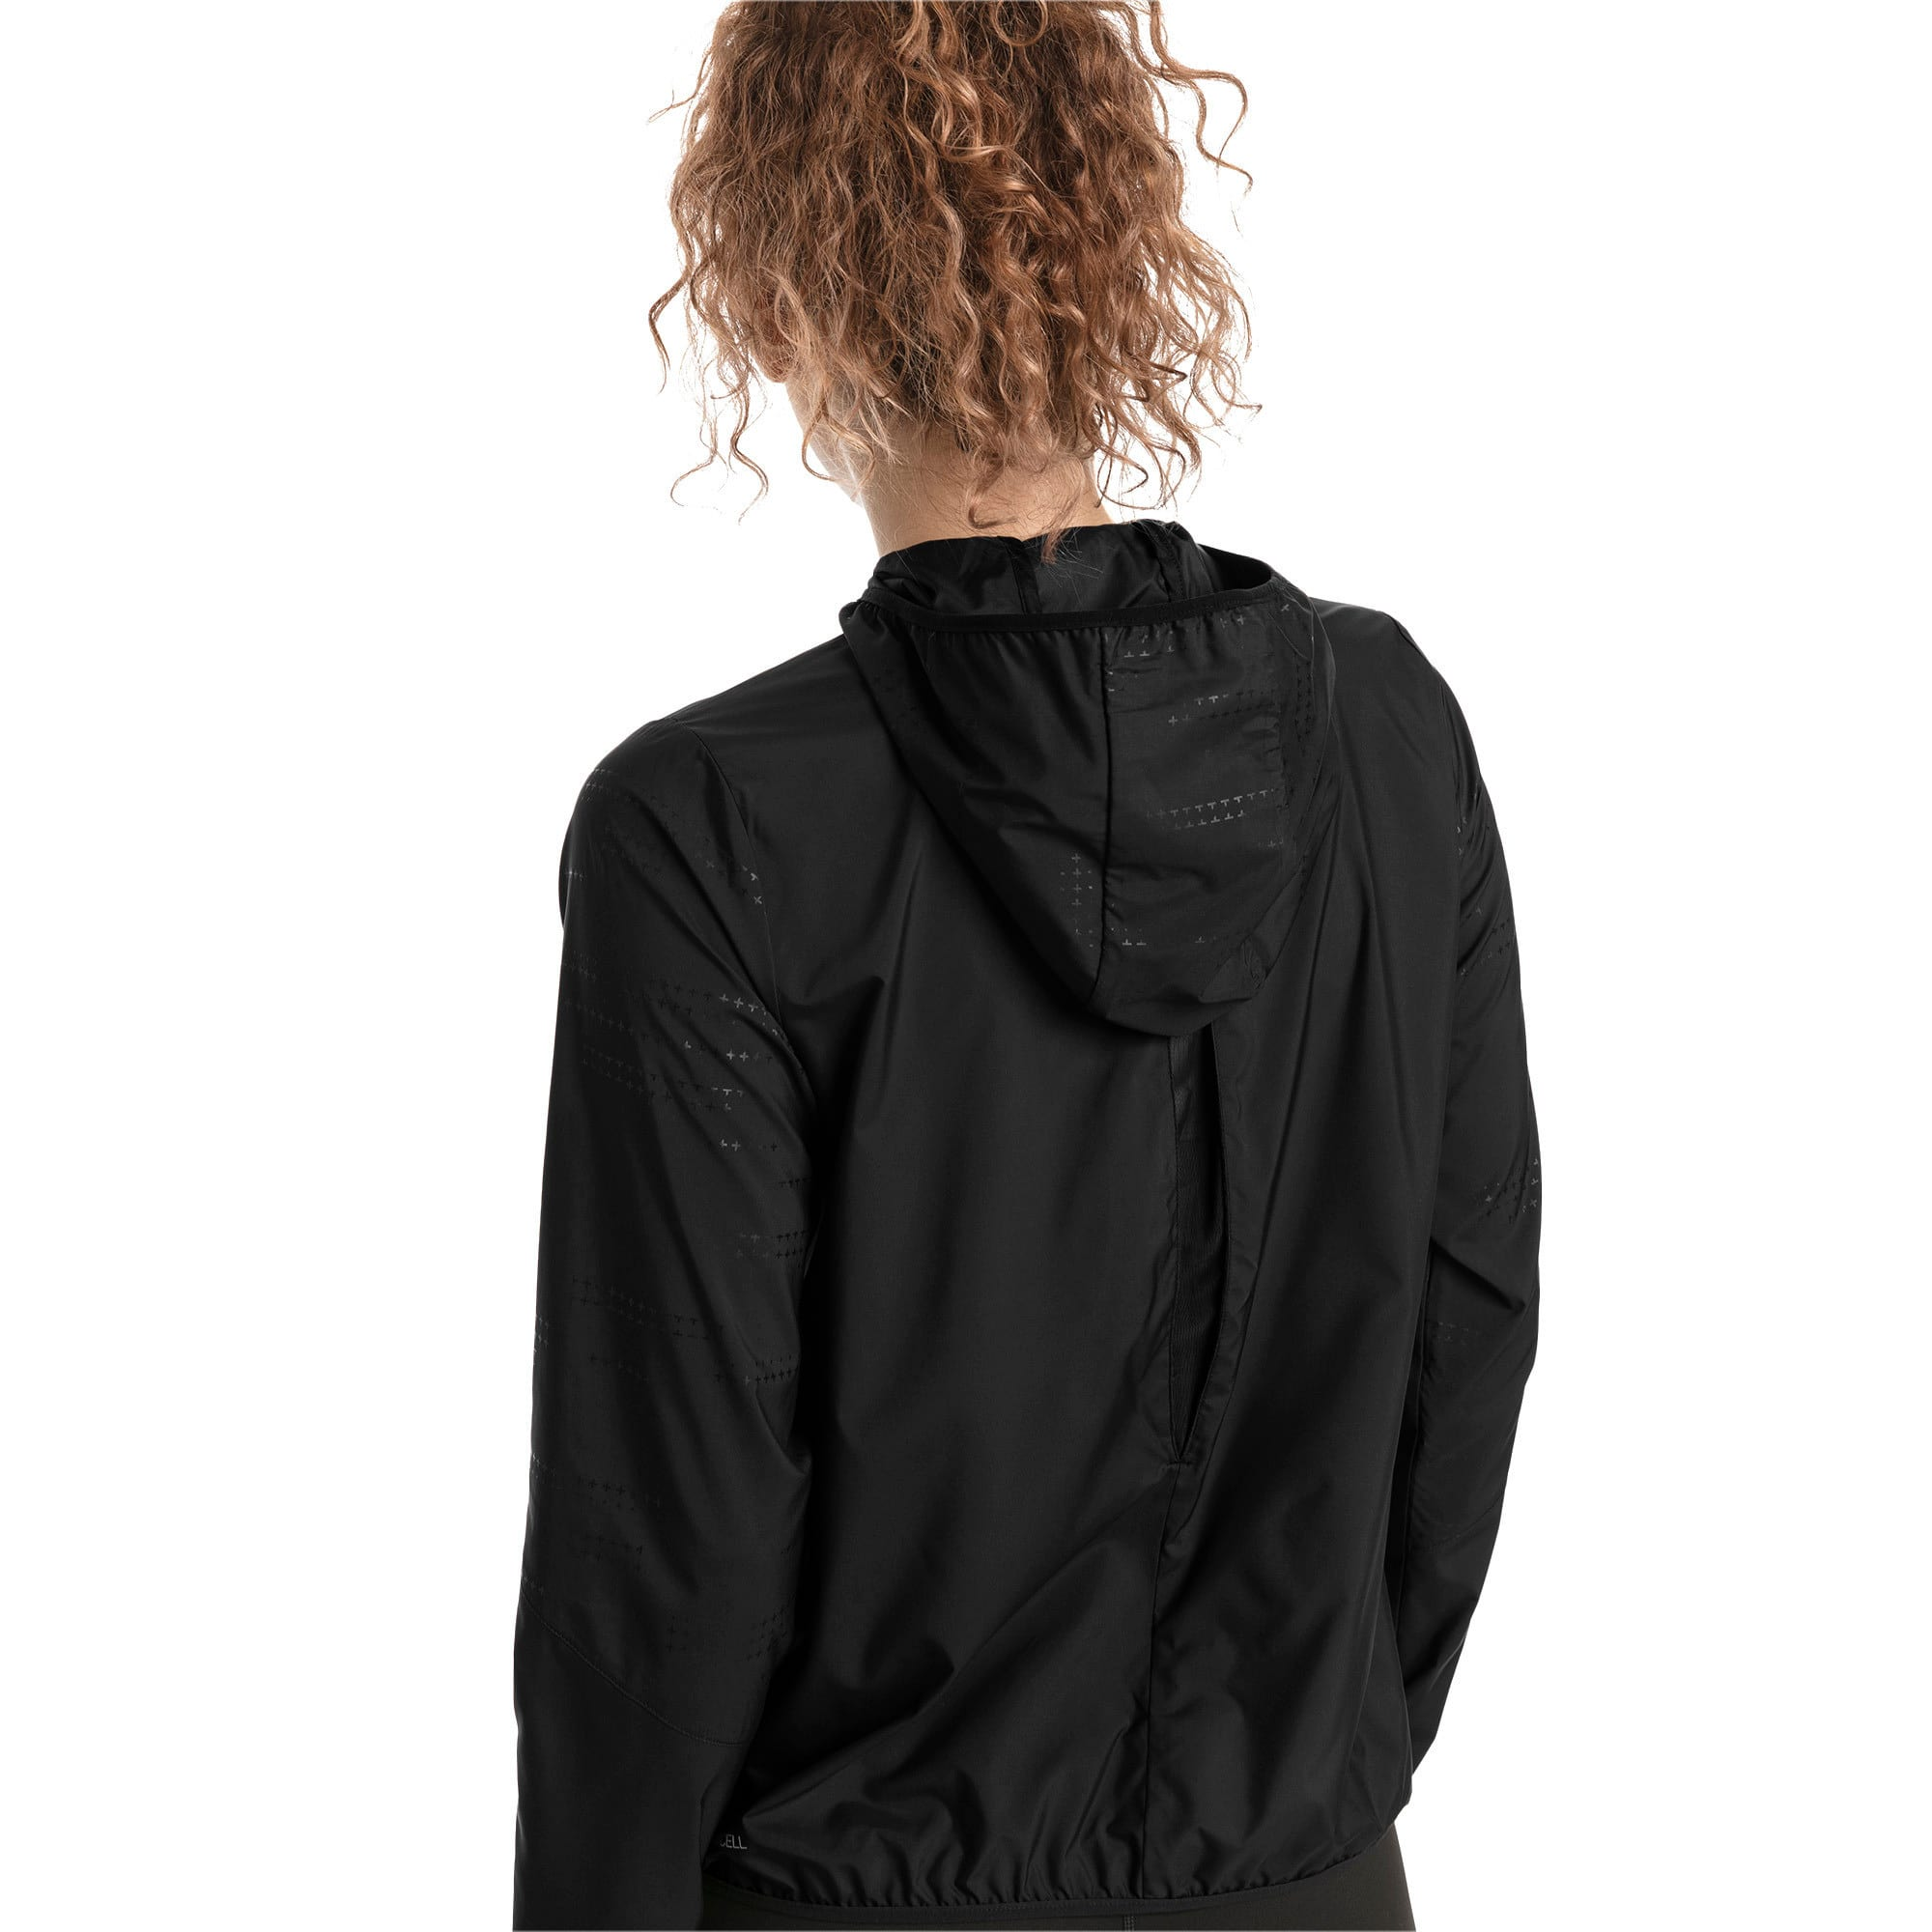 Thumbnail 2 of Ignite Women's Hooded Wind Jacket, Puma Black, medium